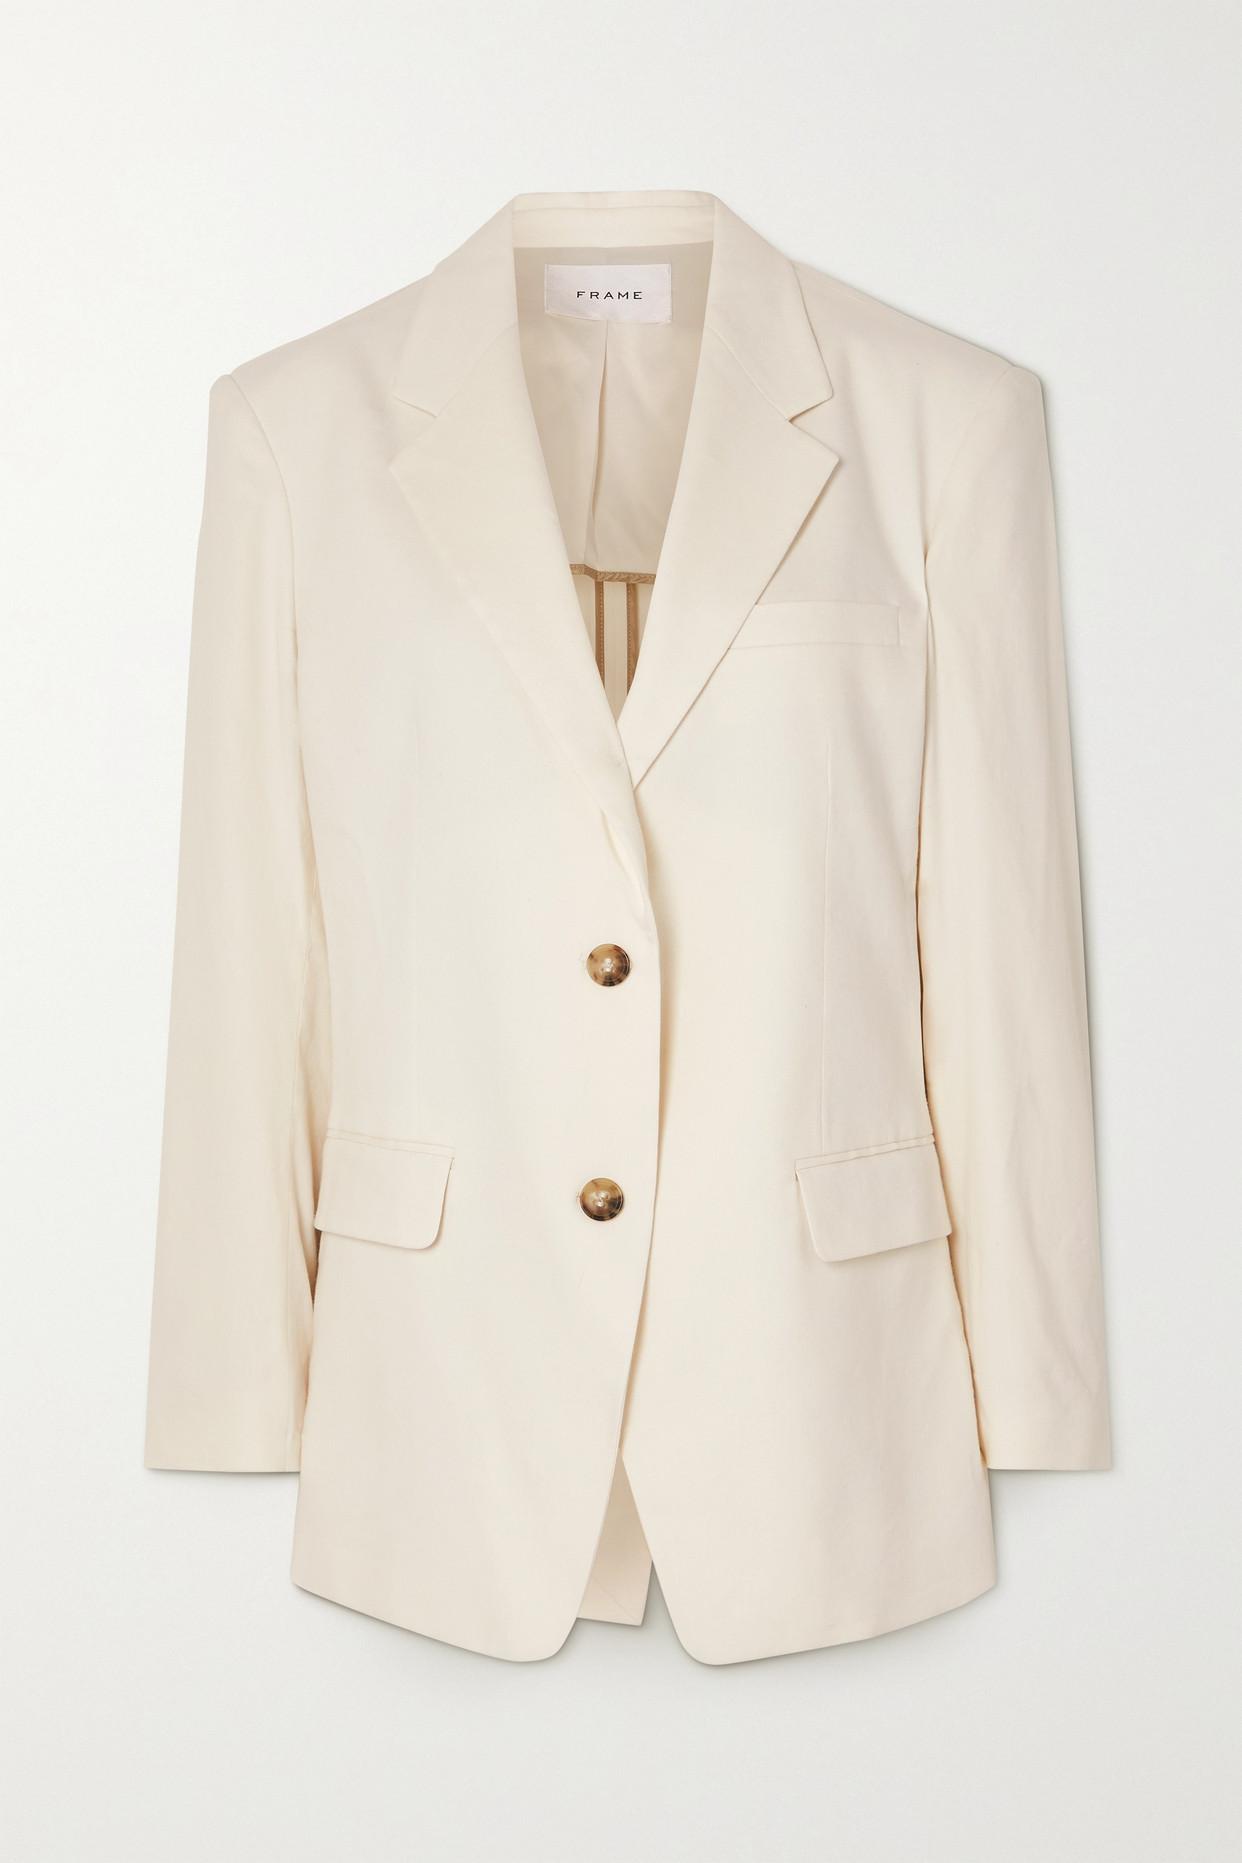 FRAME - Grandfather Cotton-blend Blazer - Off-white - small